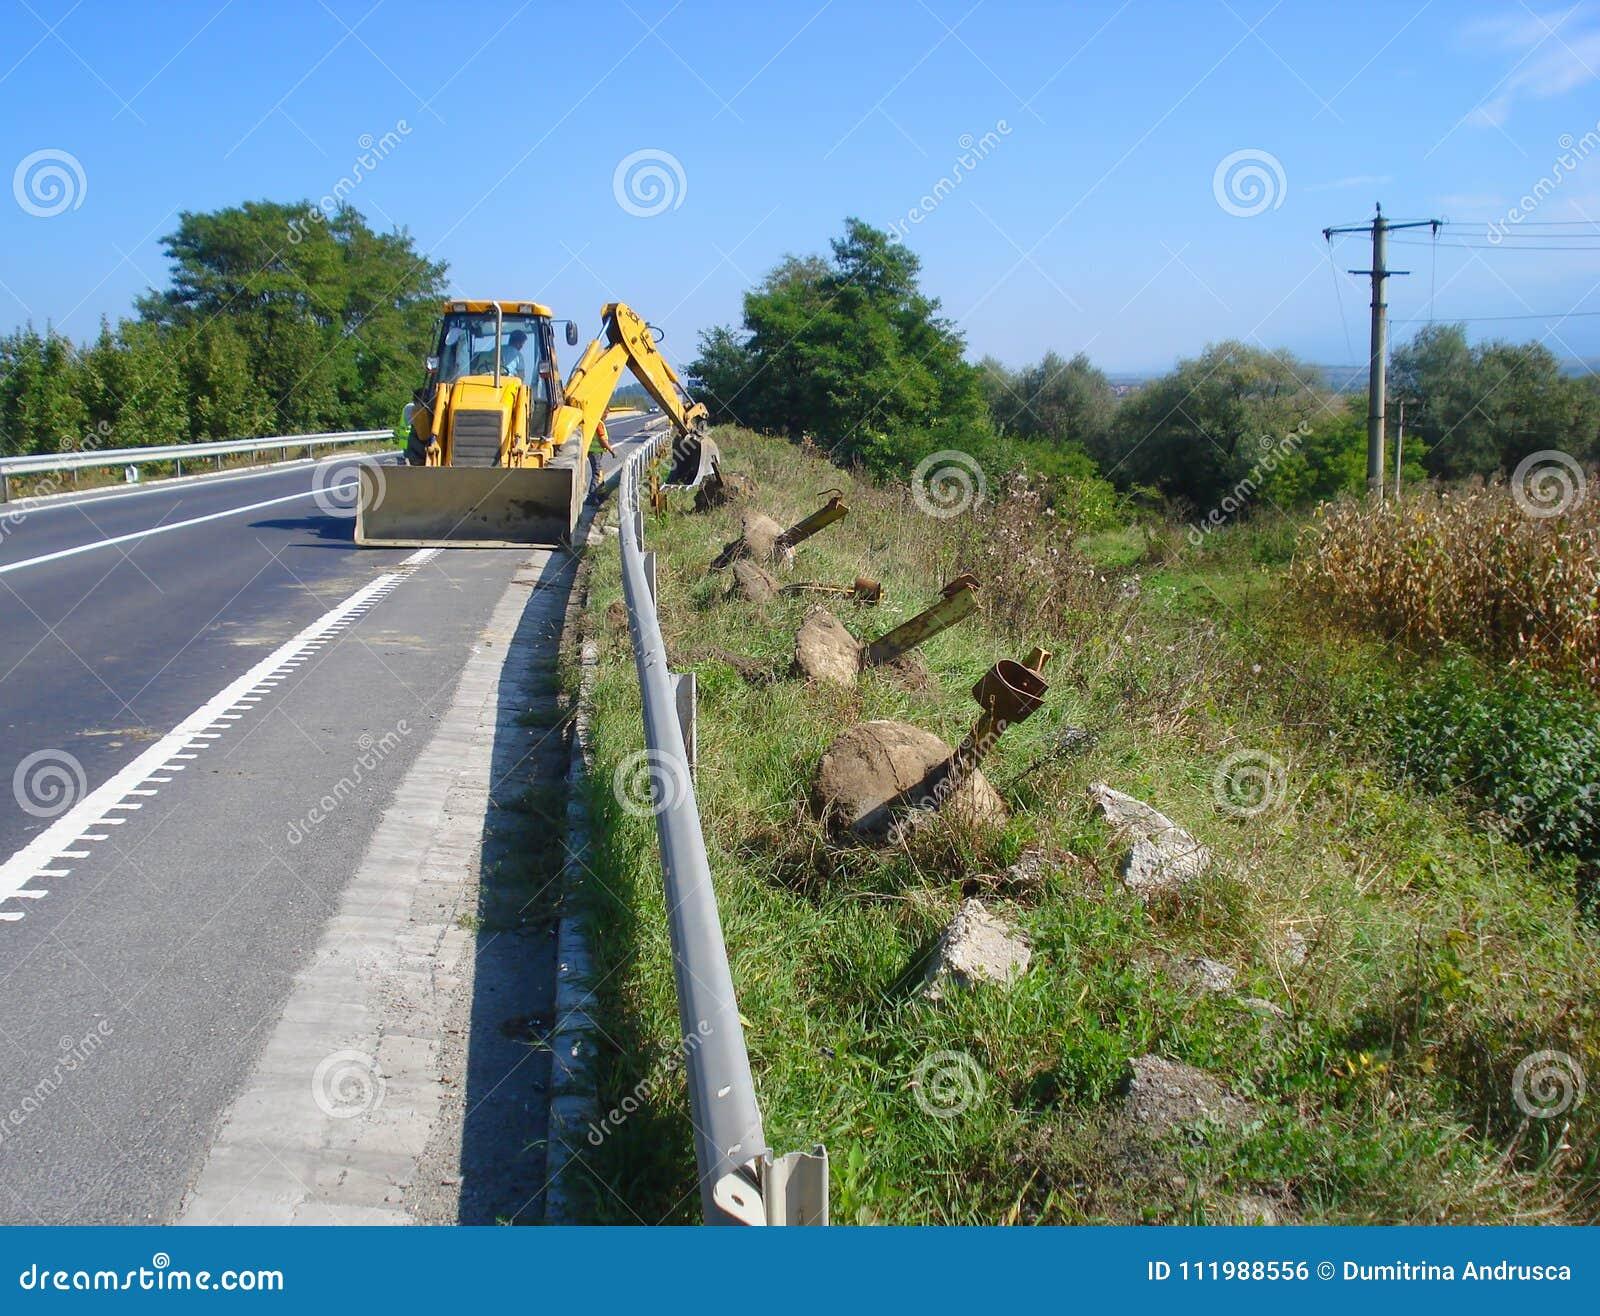 Желтый backhoe на дороге